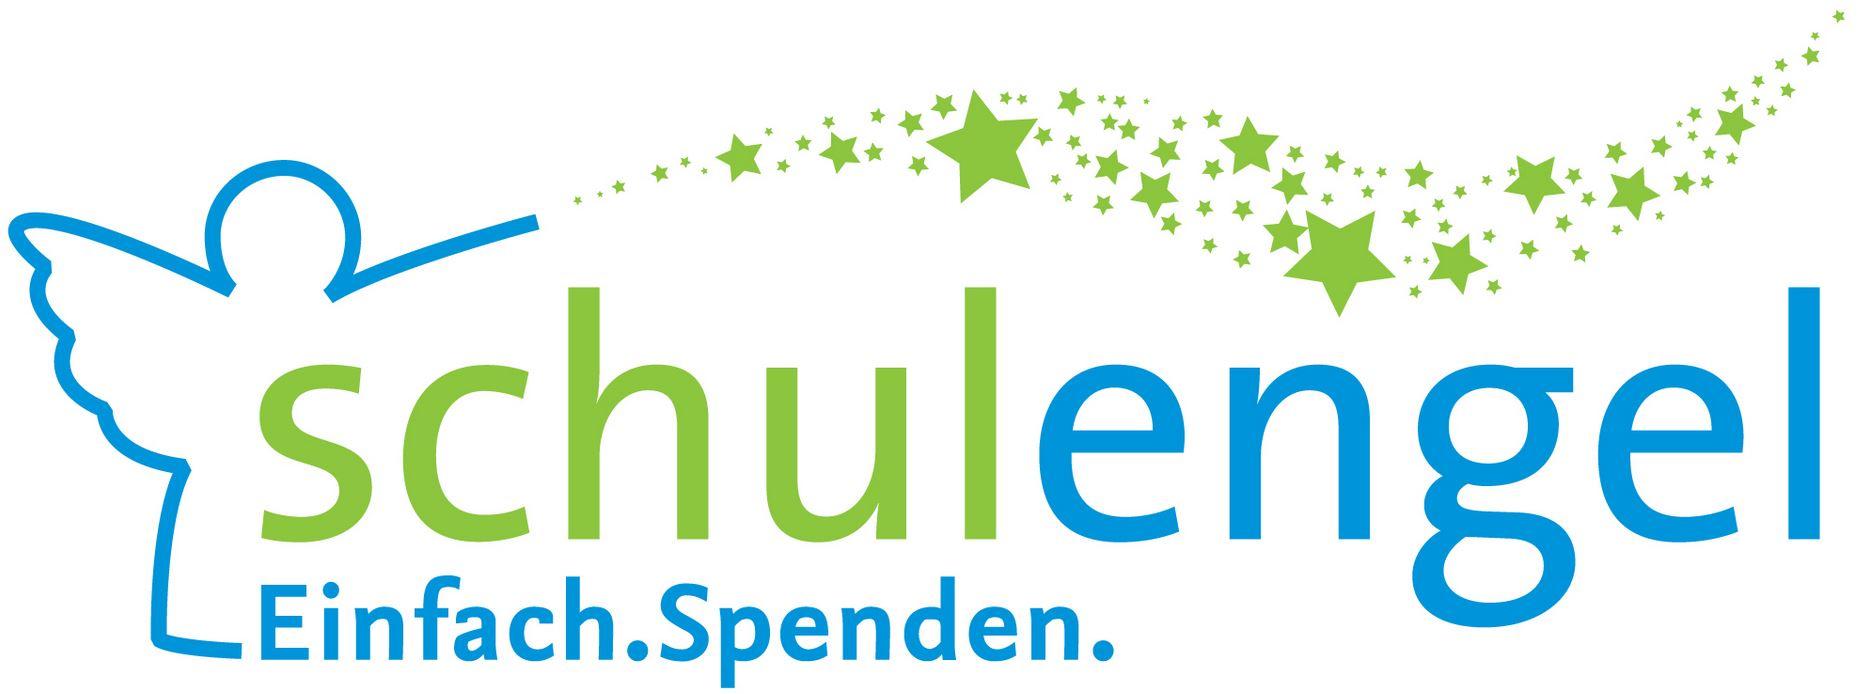 Schulengel-Logo